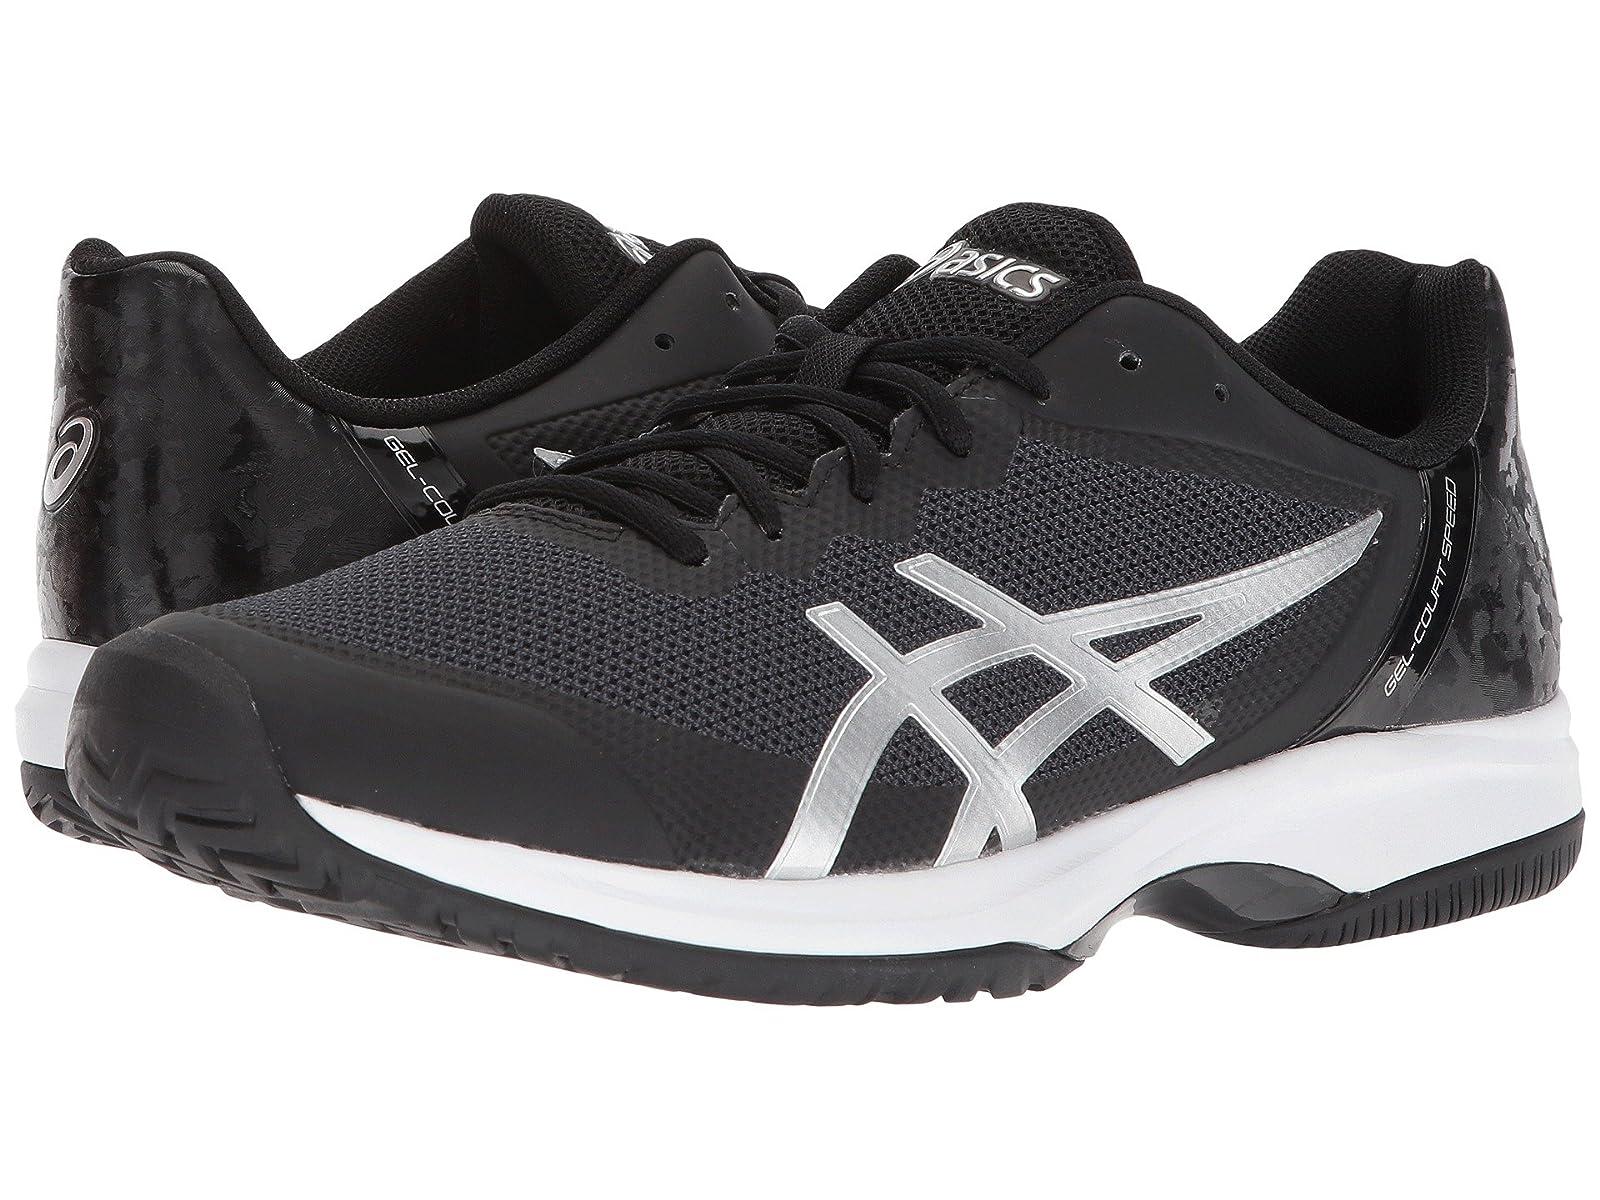 ASICS Gel-Court SpeedAtmospheric grades have affordable shoes